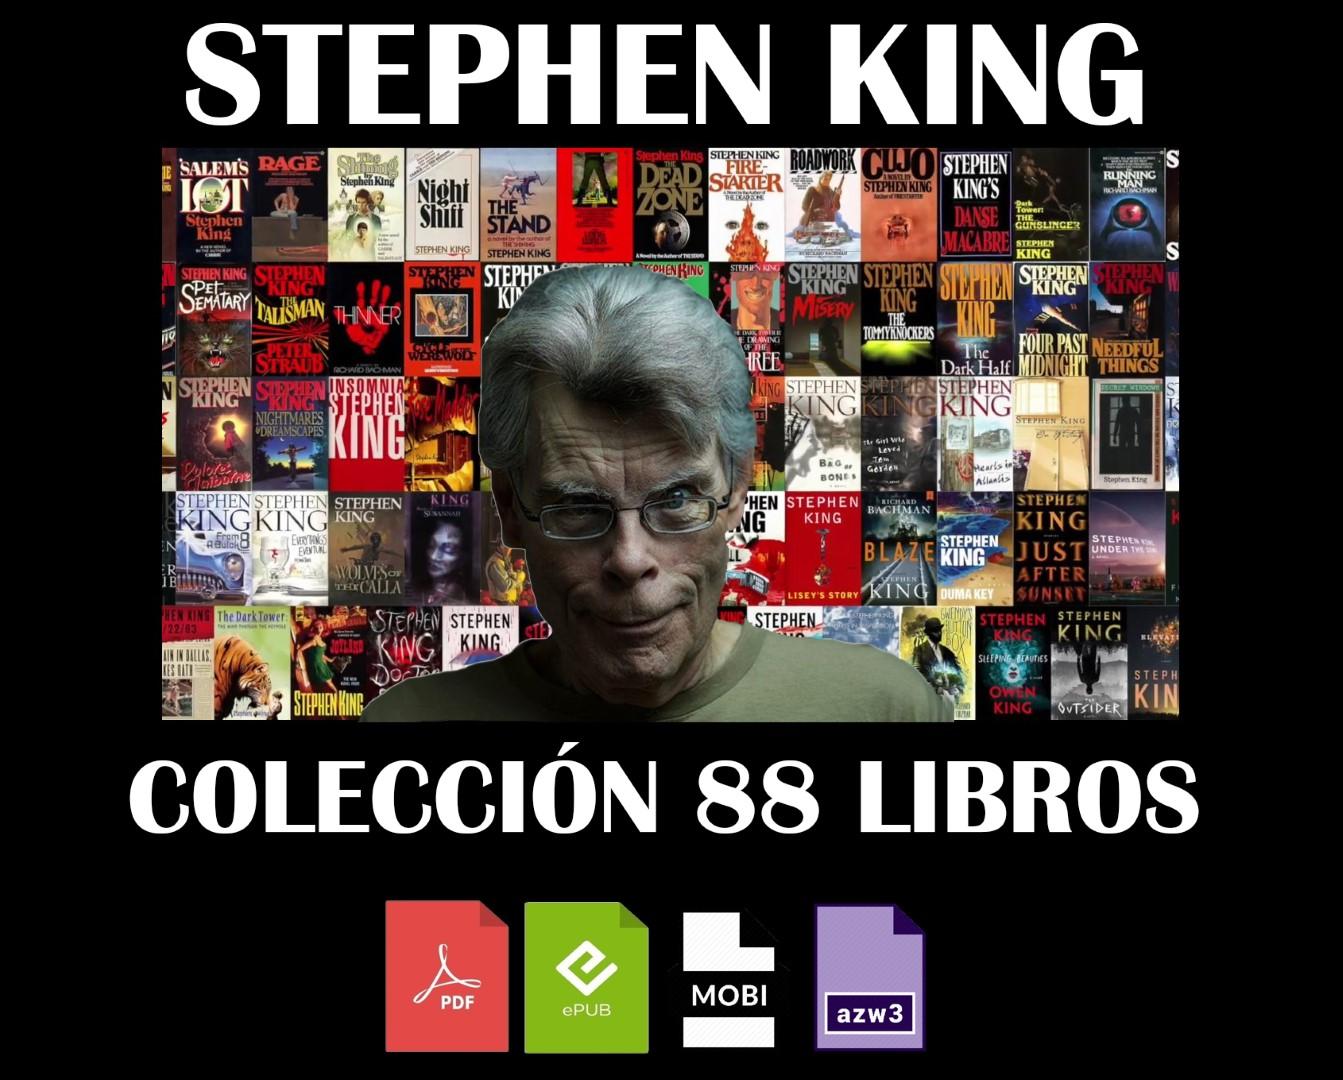 Tienda Ebook King Stephen Coleccion 88 Libros Cod 046 Epub Mobi Pdf Azw3